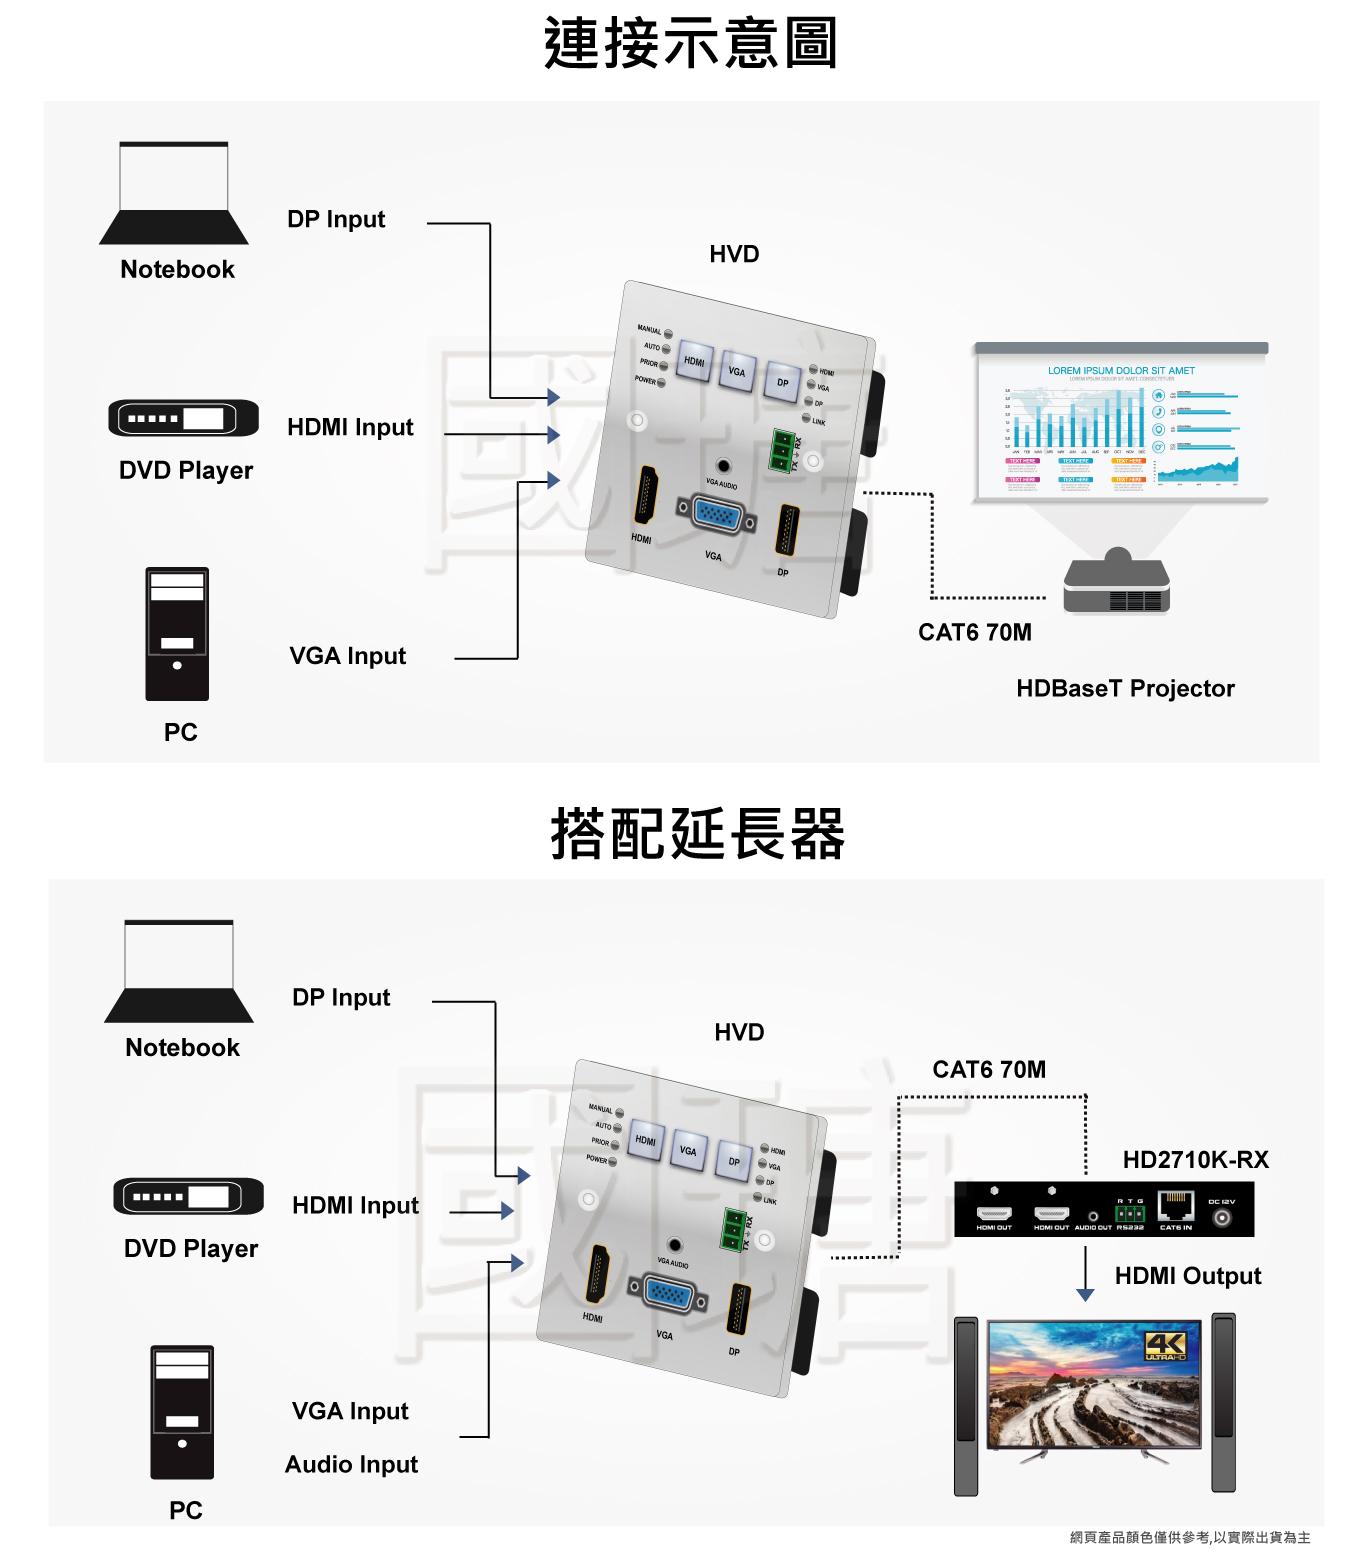 4K HDMI、DP、VGA分散式延伸壁上座插, HDBaseT延伸技術, 壁掛式影音訊號延長器 | 台灣ACAFA國瑭